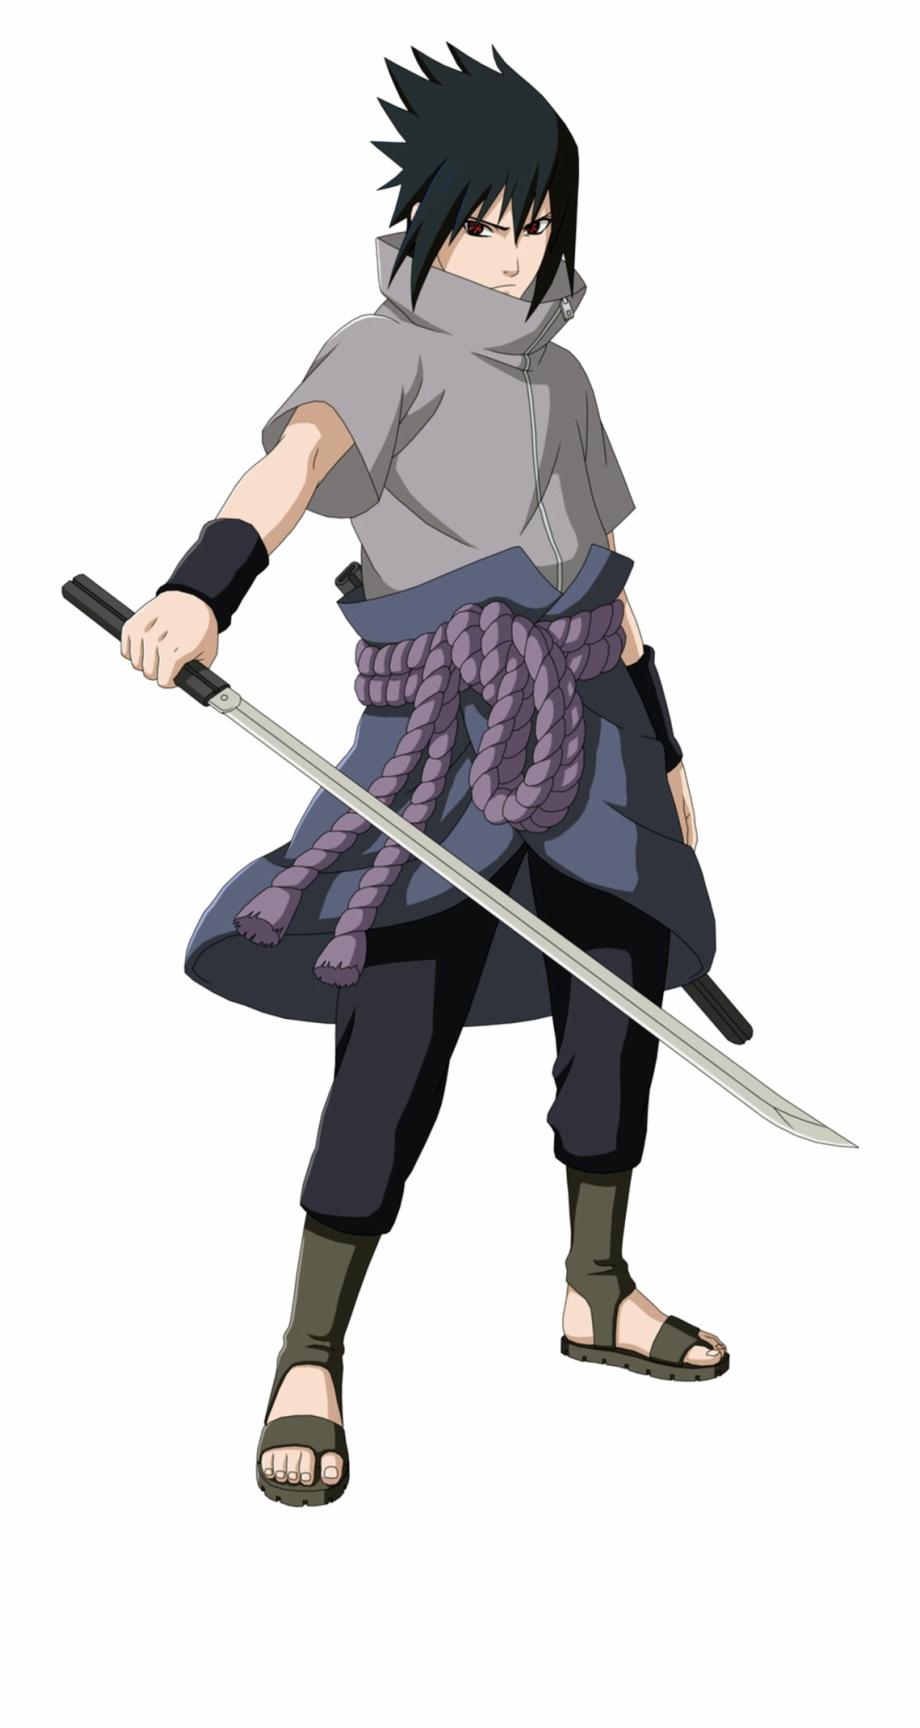 Uchiha Sasuke Png Transparent Image.